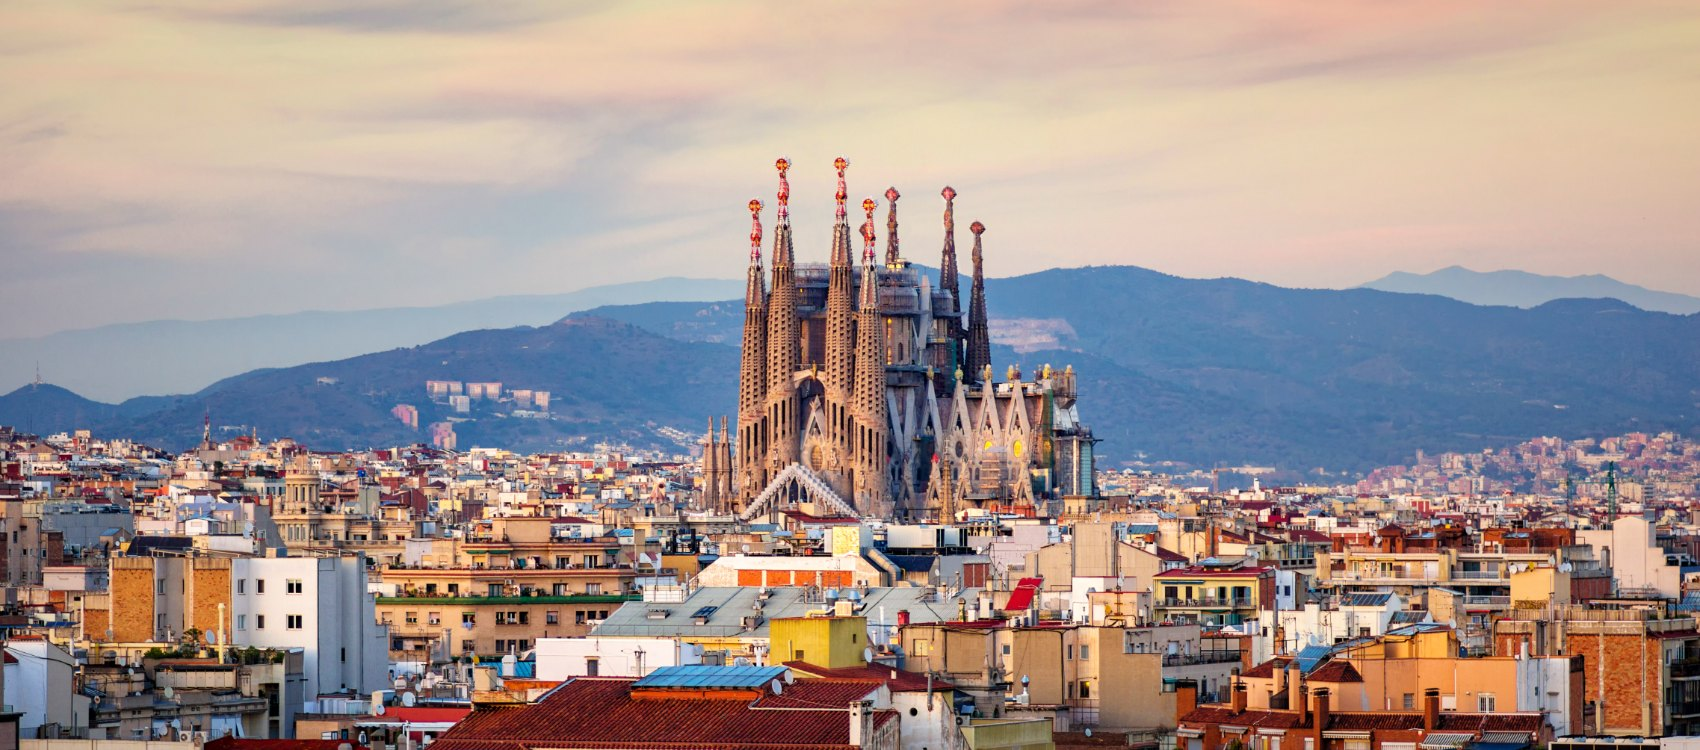 Sunset Wallpaper Hd Barcelona Skyline Life Is Suite